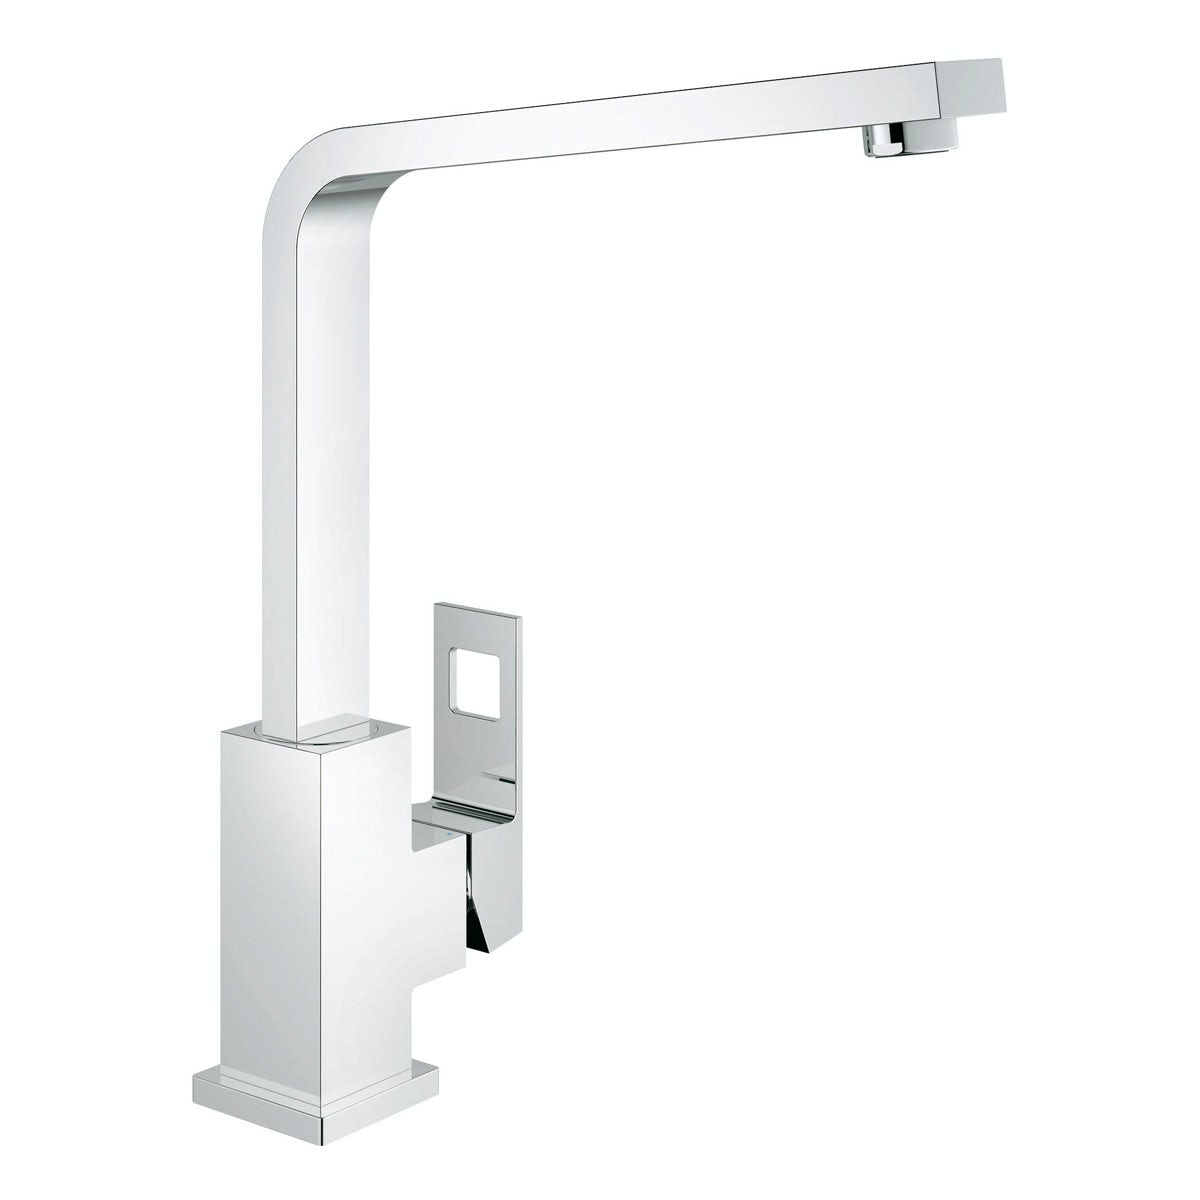 Grohe Eurocube kitchen tap